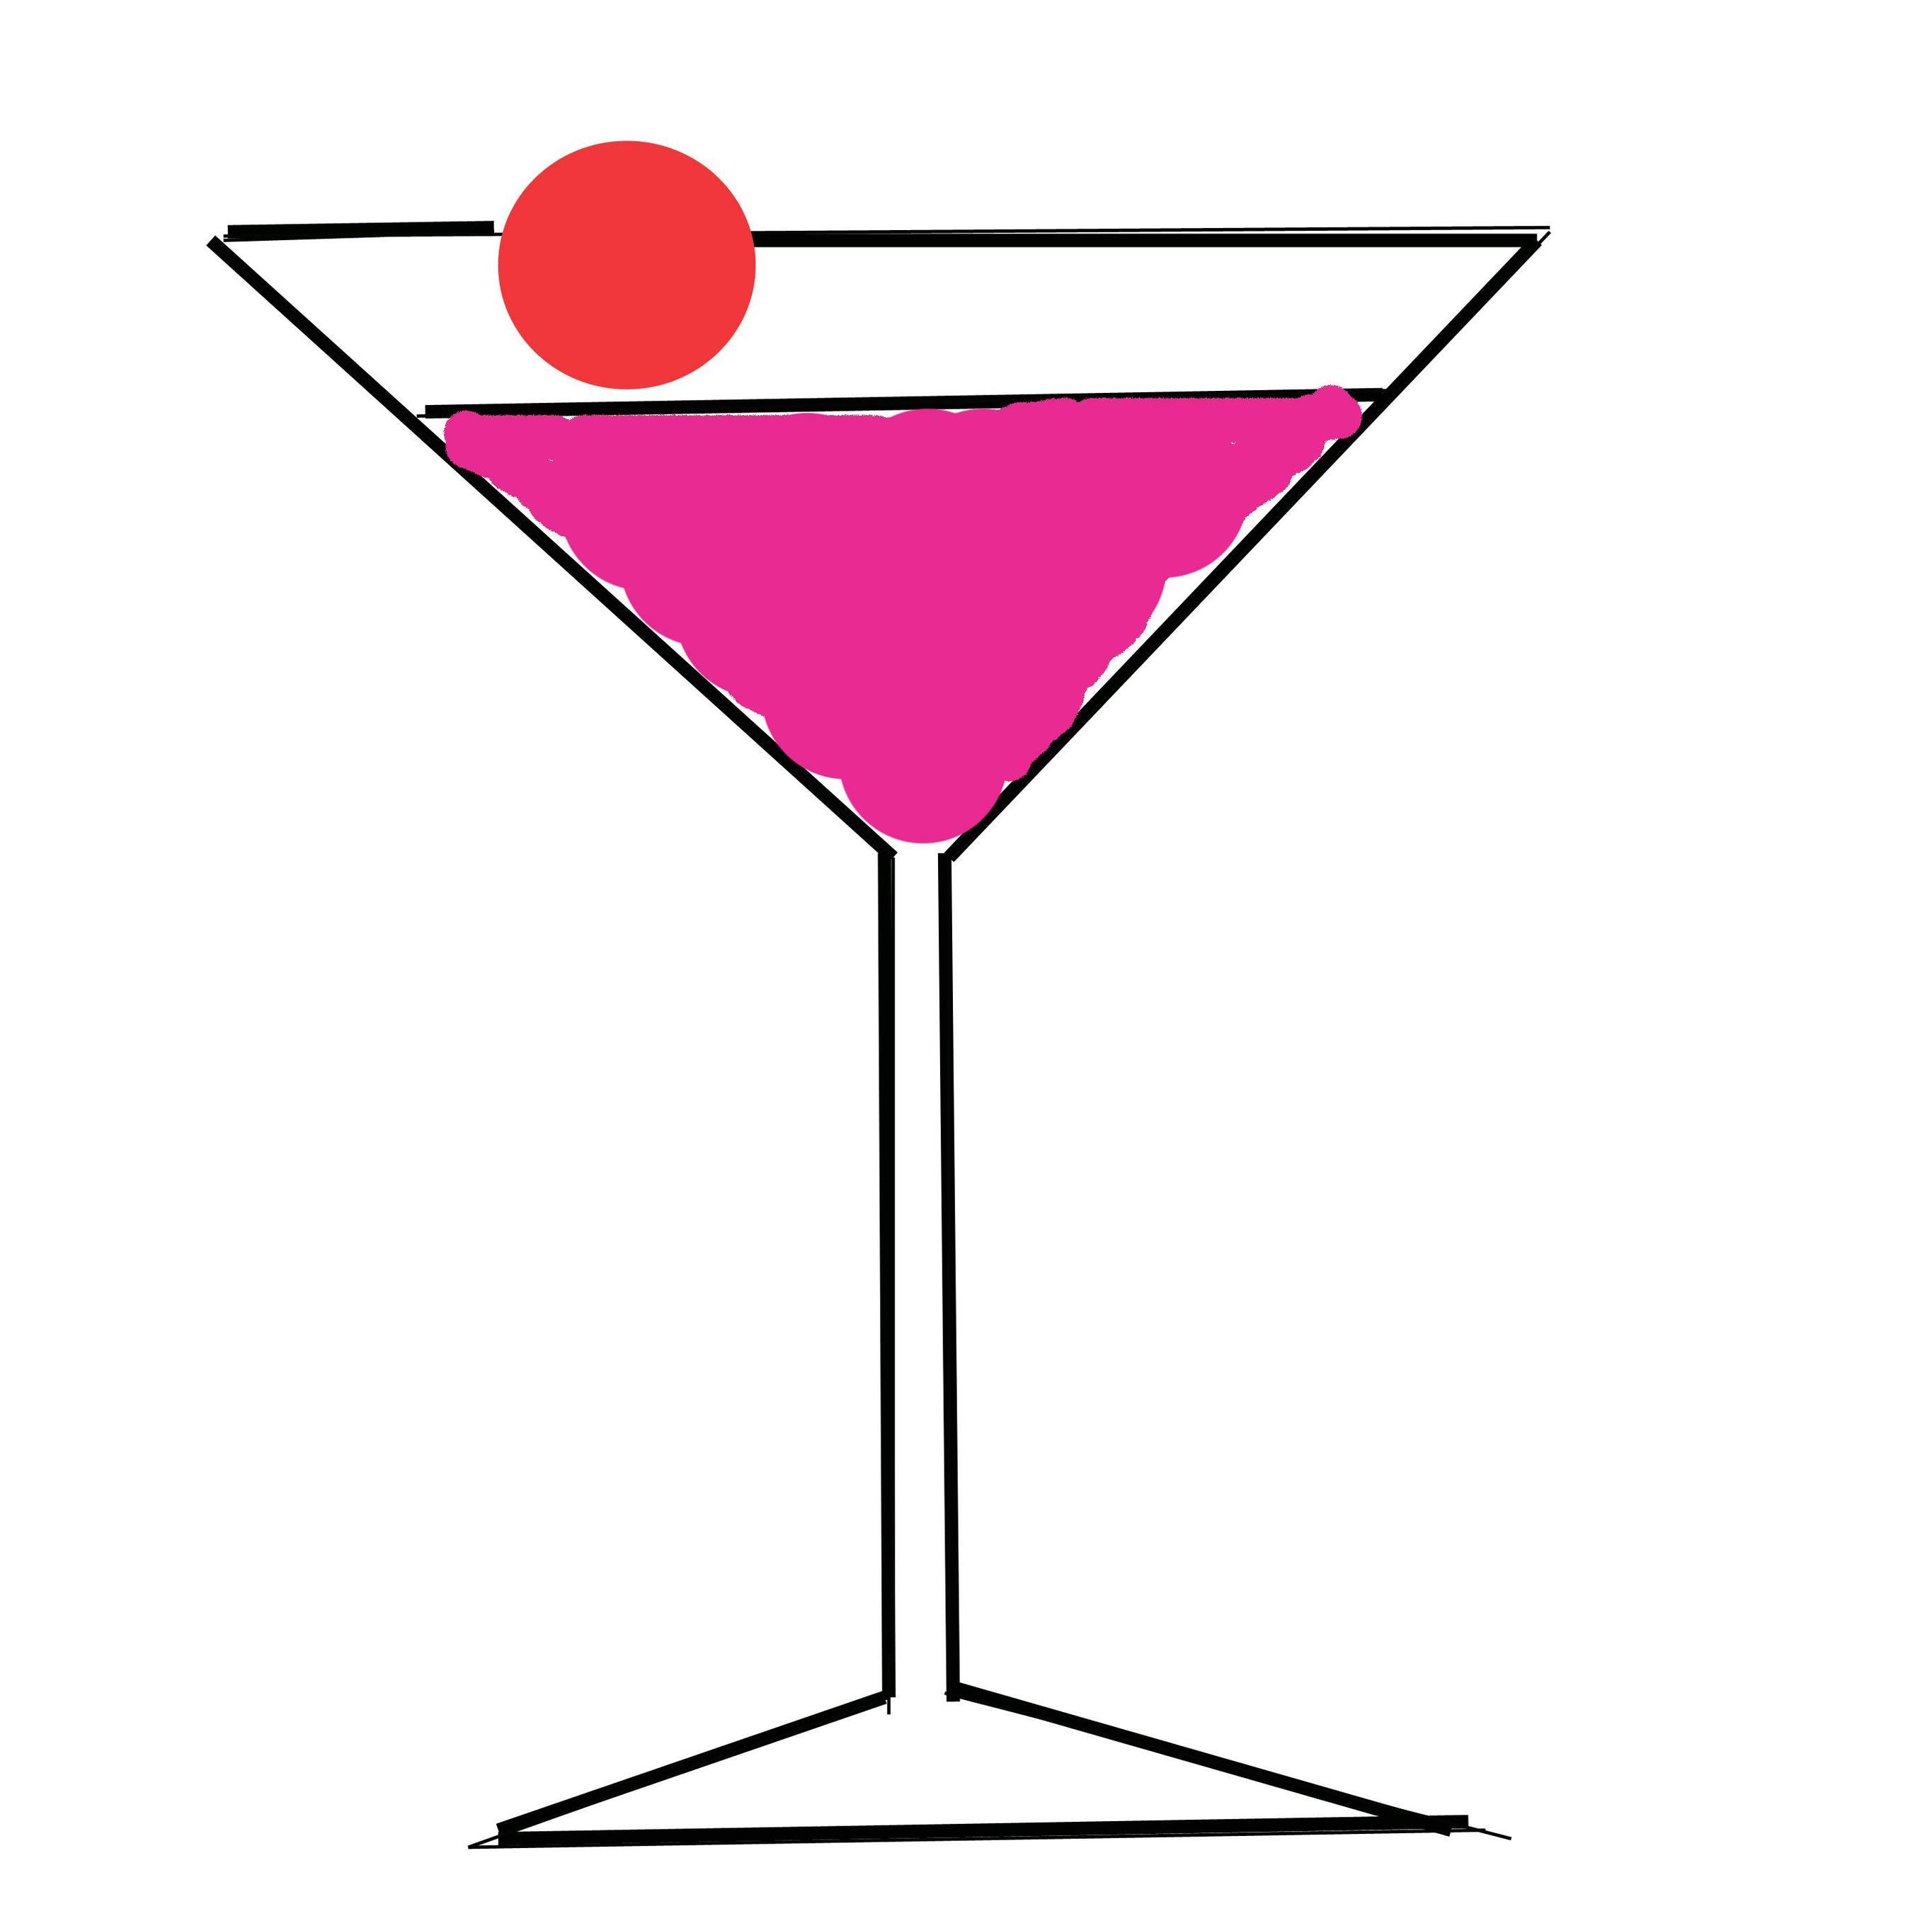 Cute martini glass clipart.